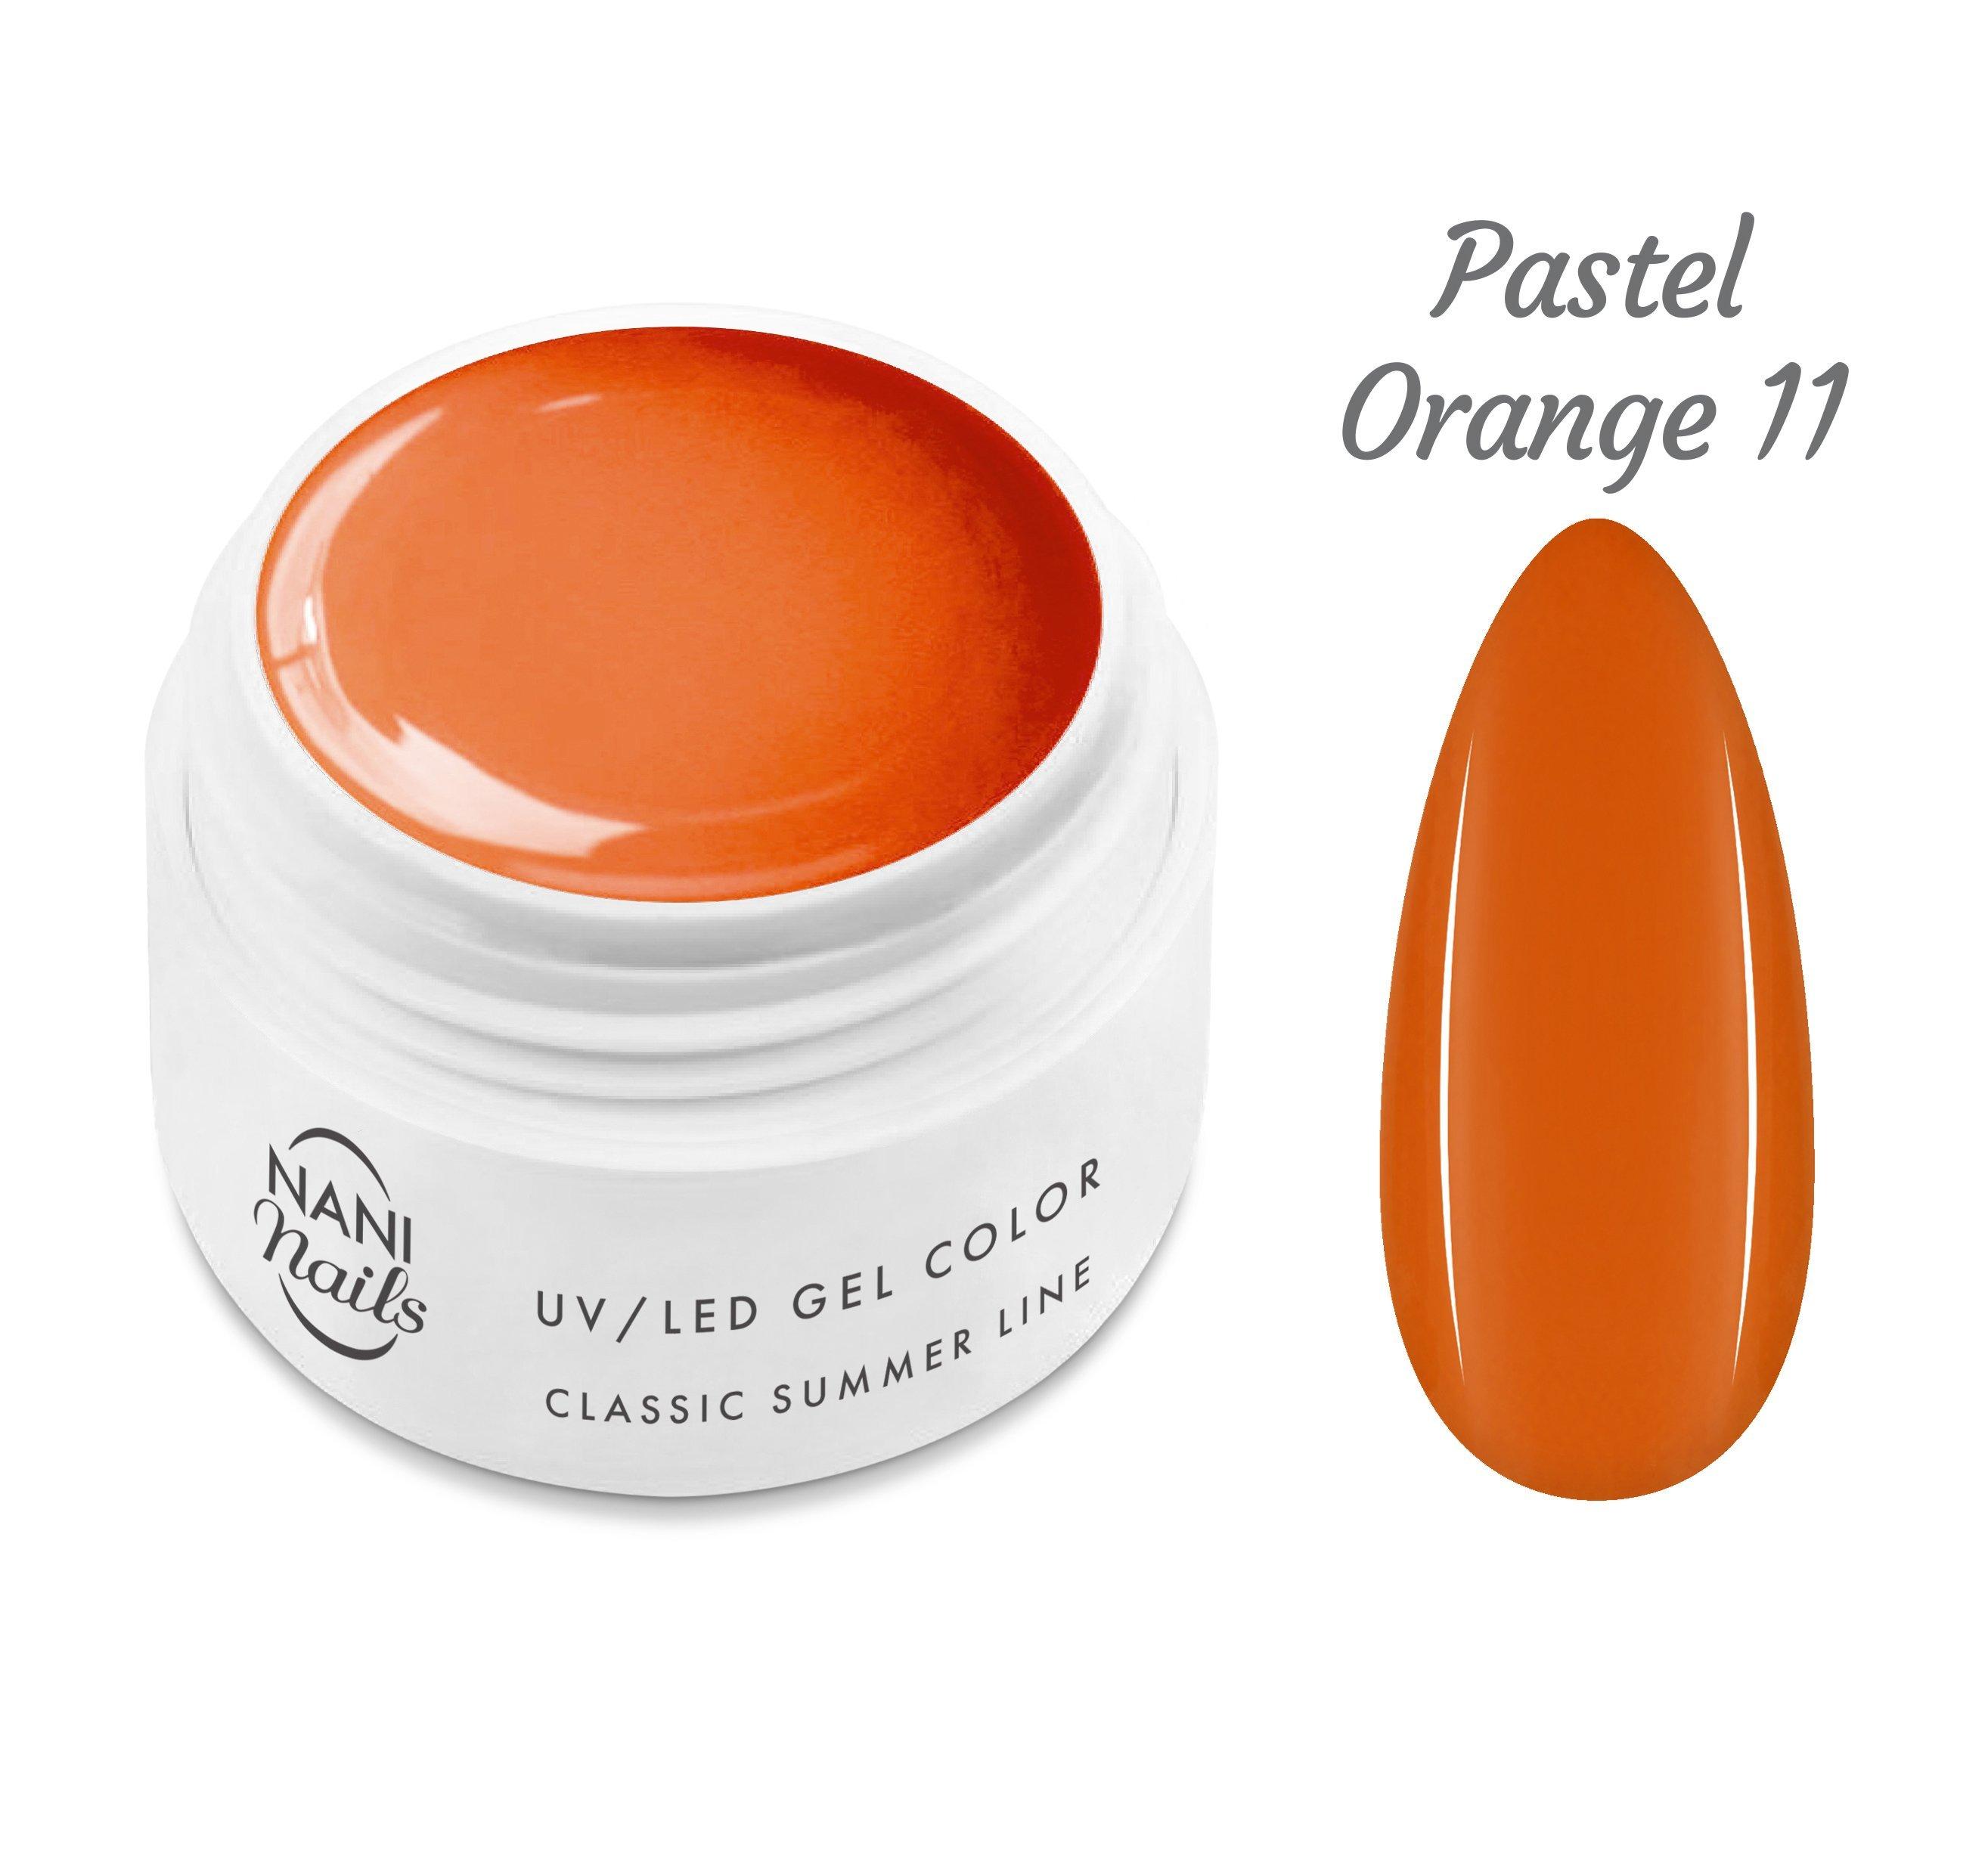 NANI UV gél Classic Summer Line 5 ml - Pastel Orange